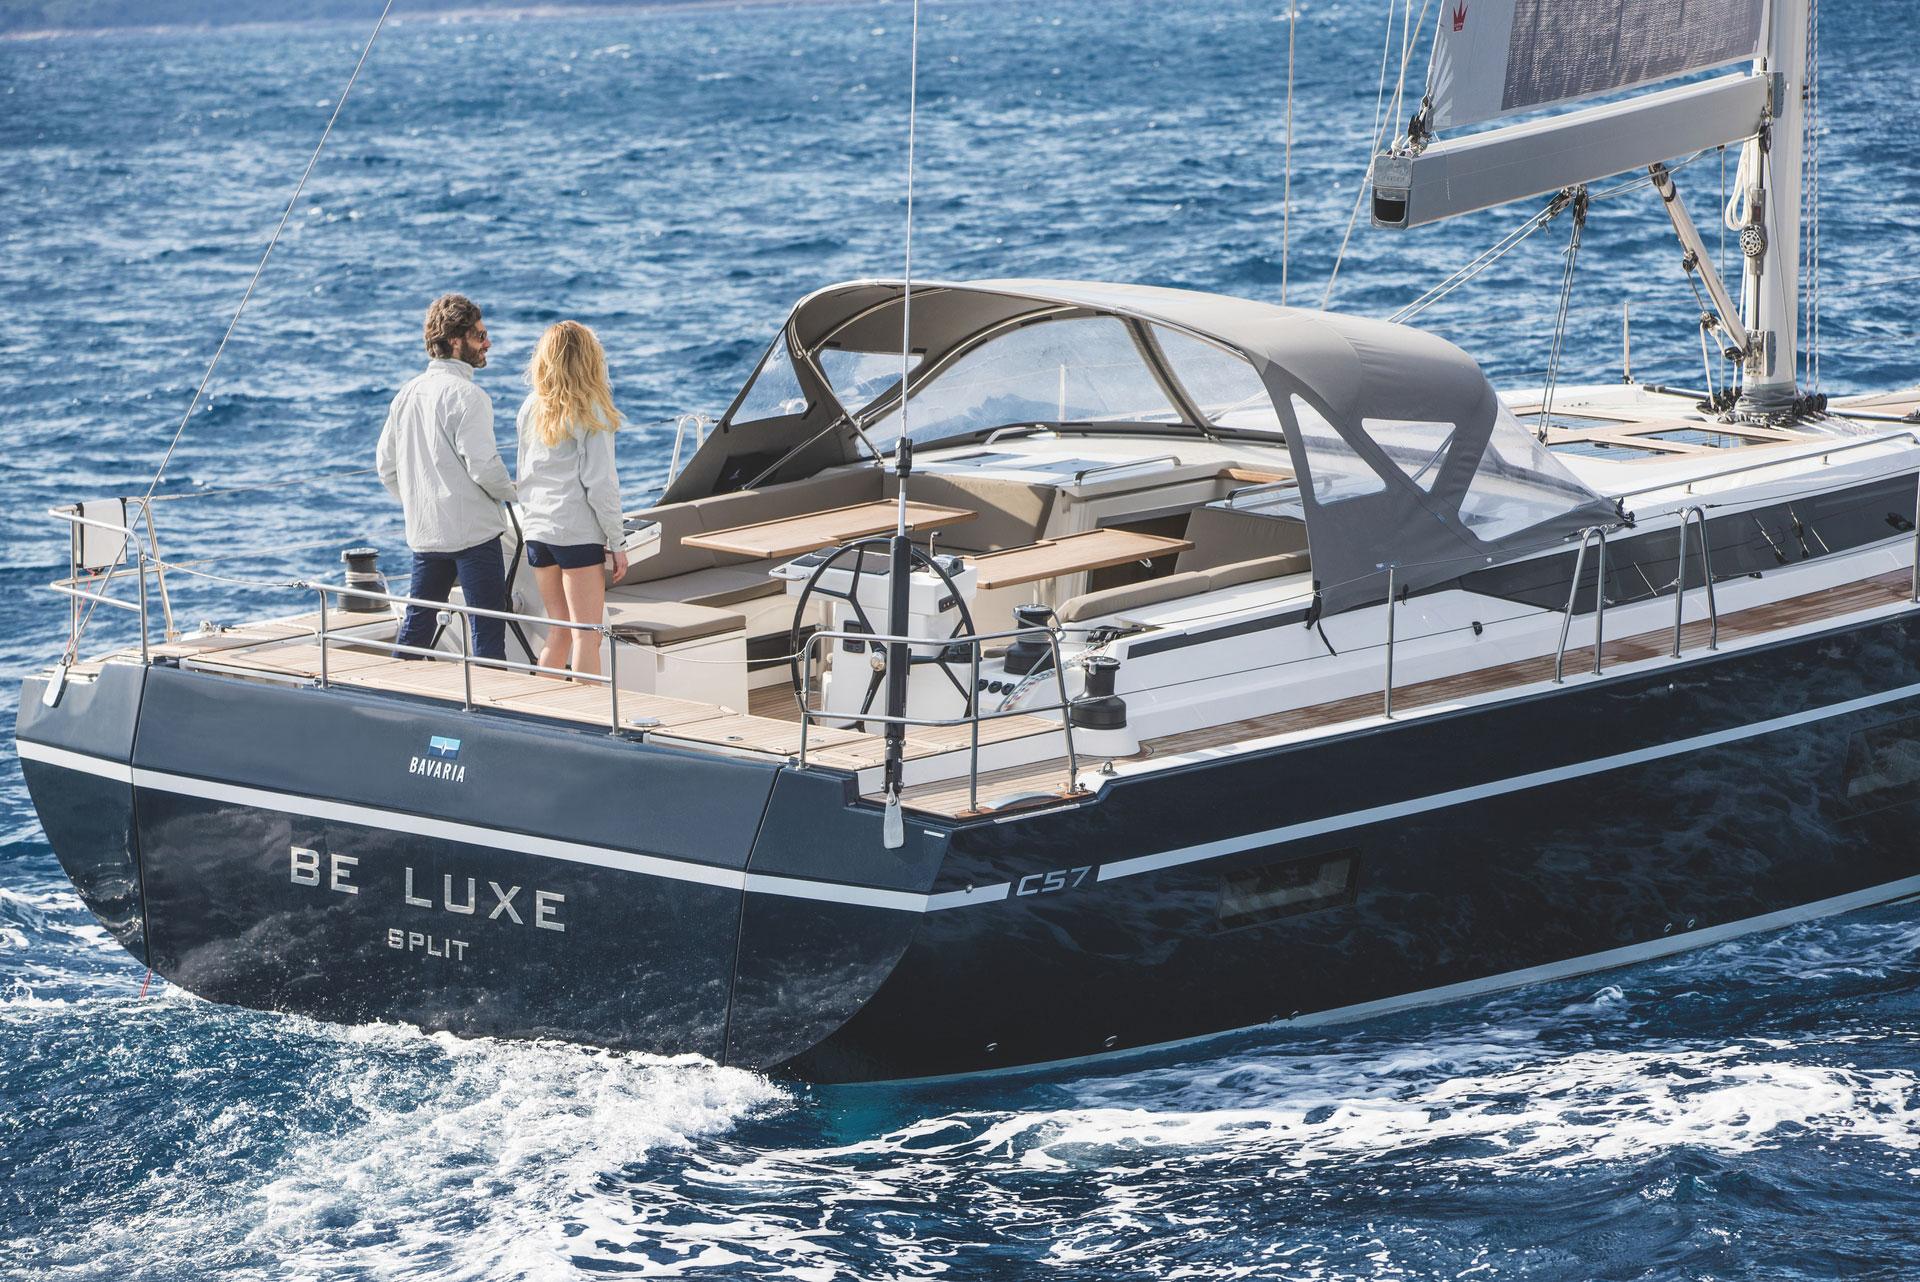 Bavaria C57 Boats for Sale - Exterior